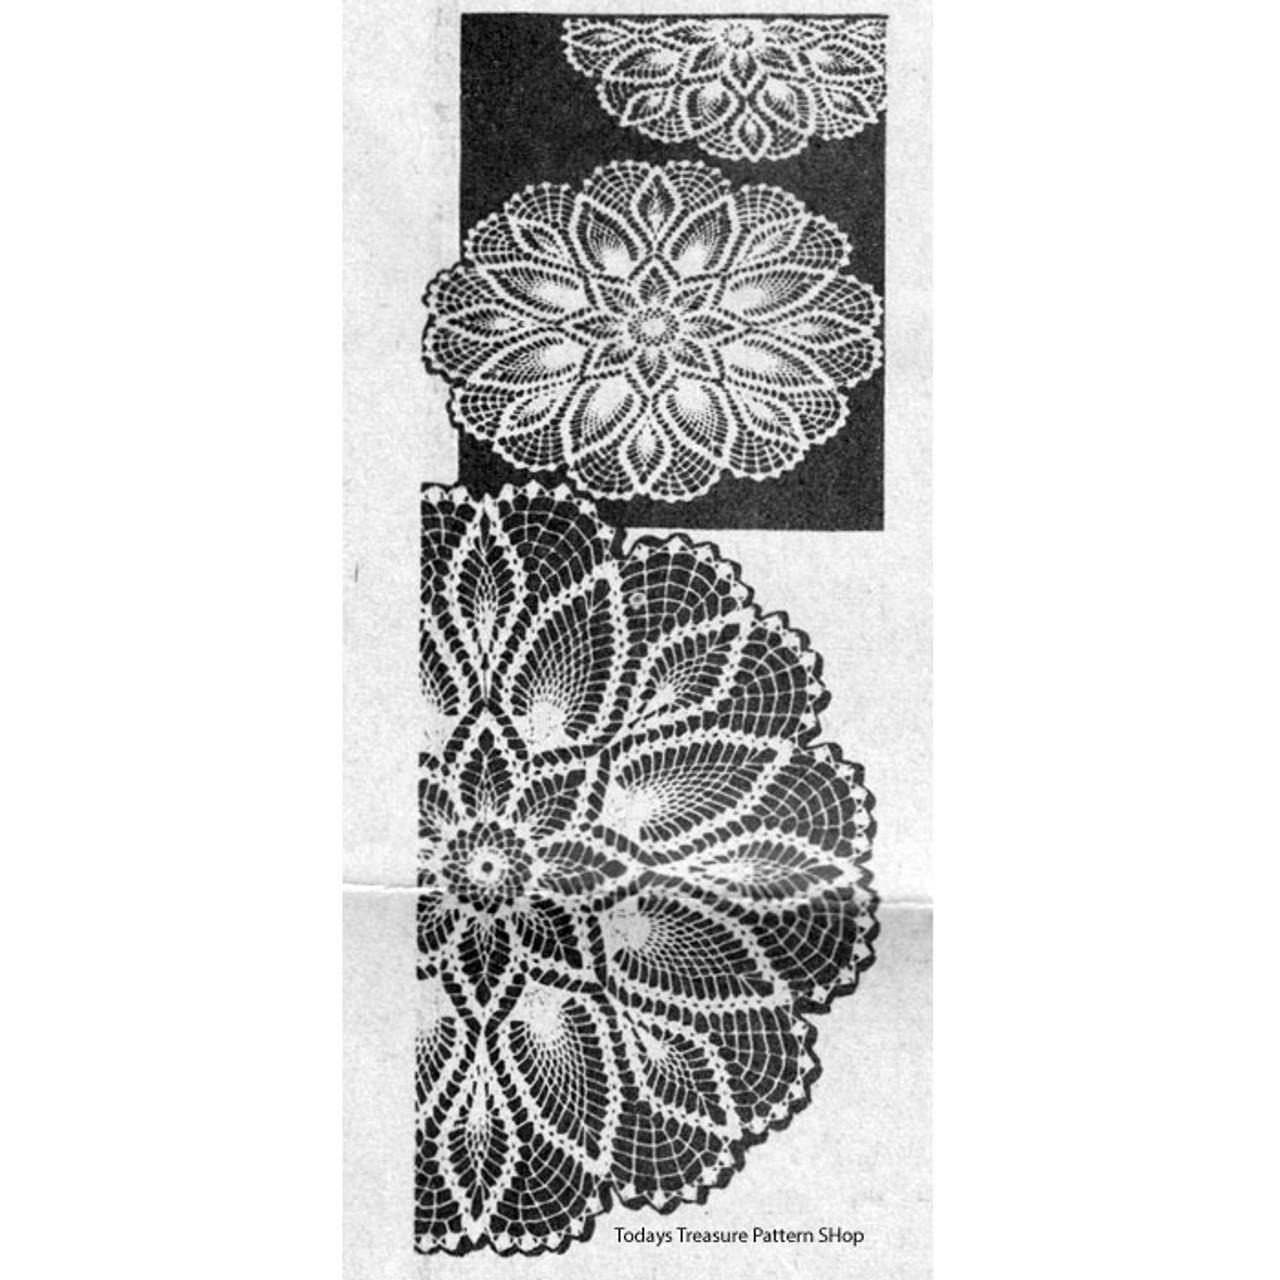 Small Pineapple Crochet Doily Pattern Design 7044